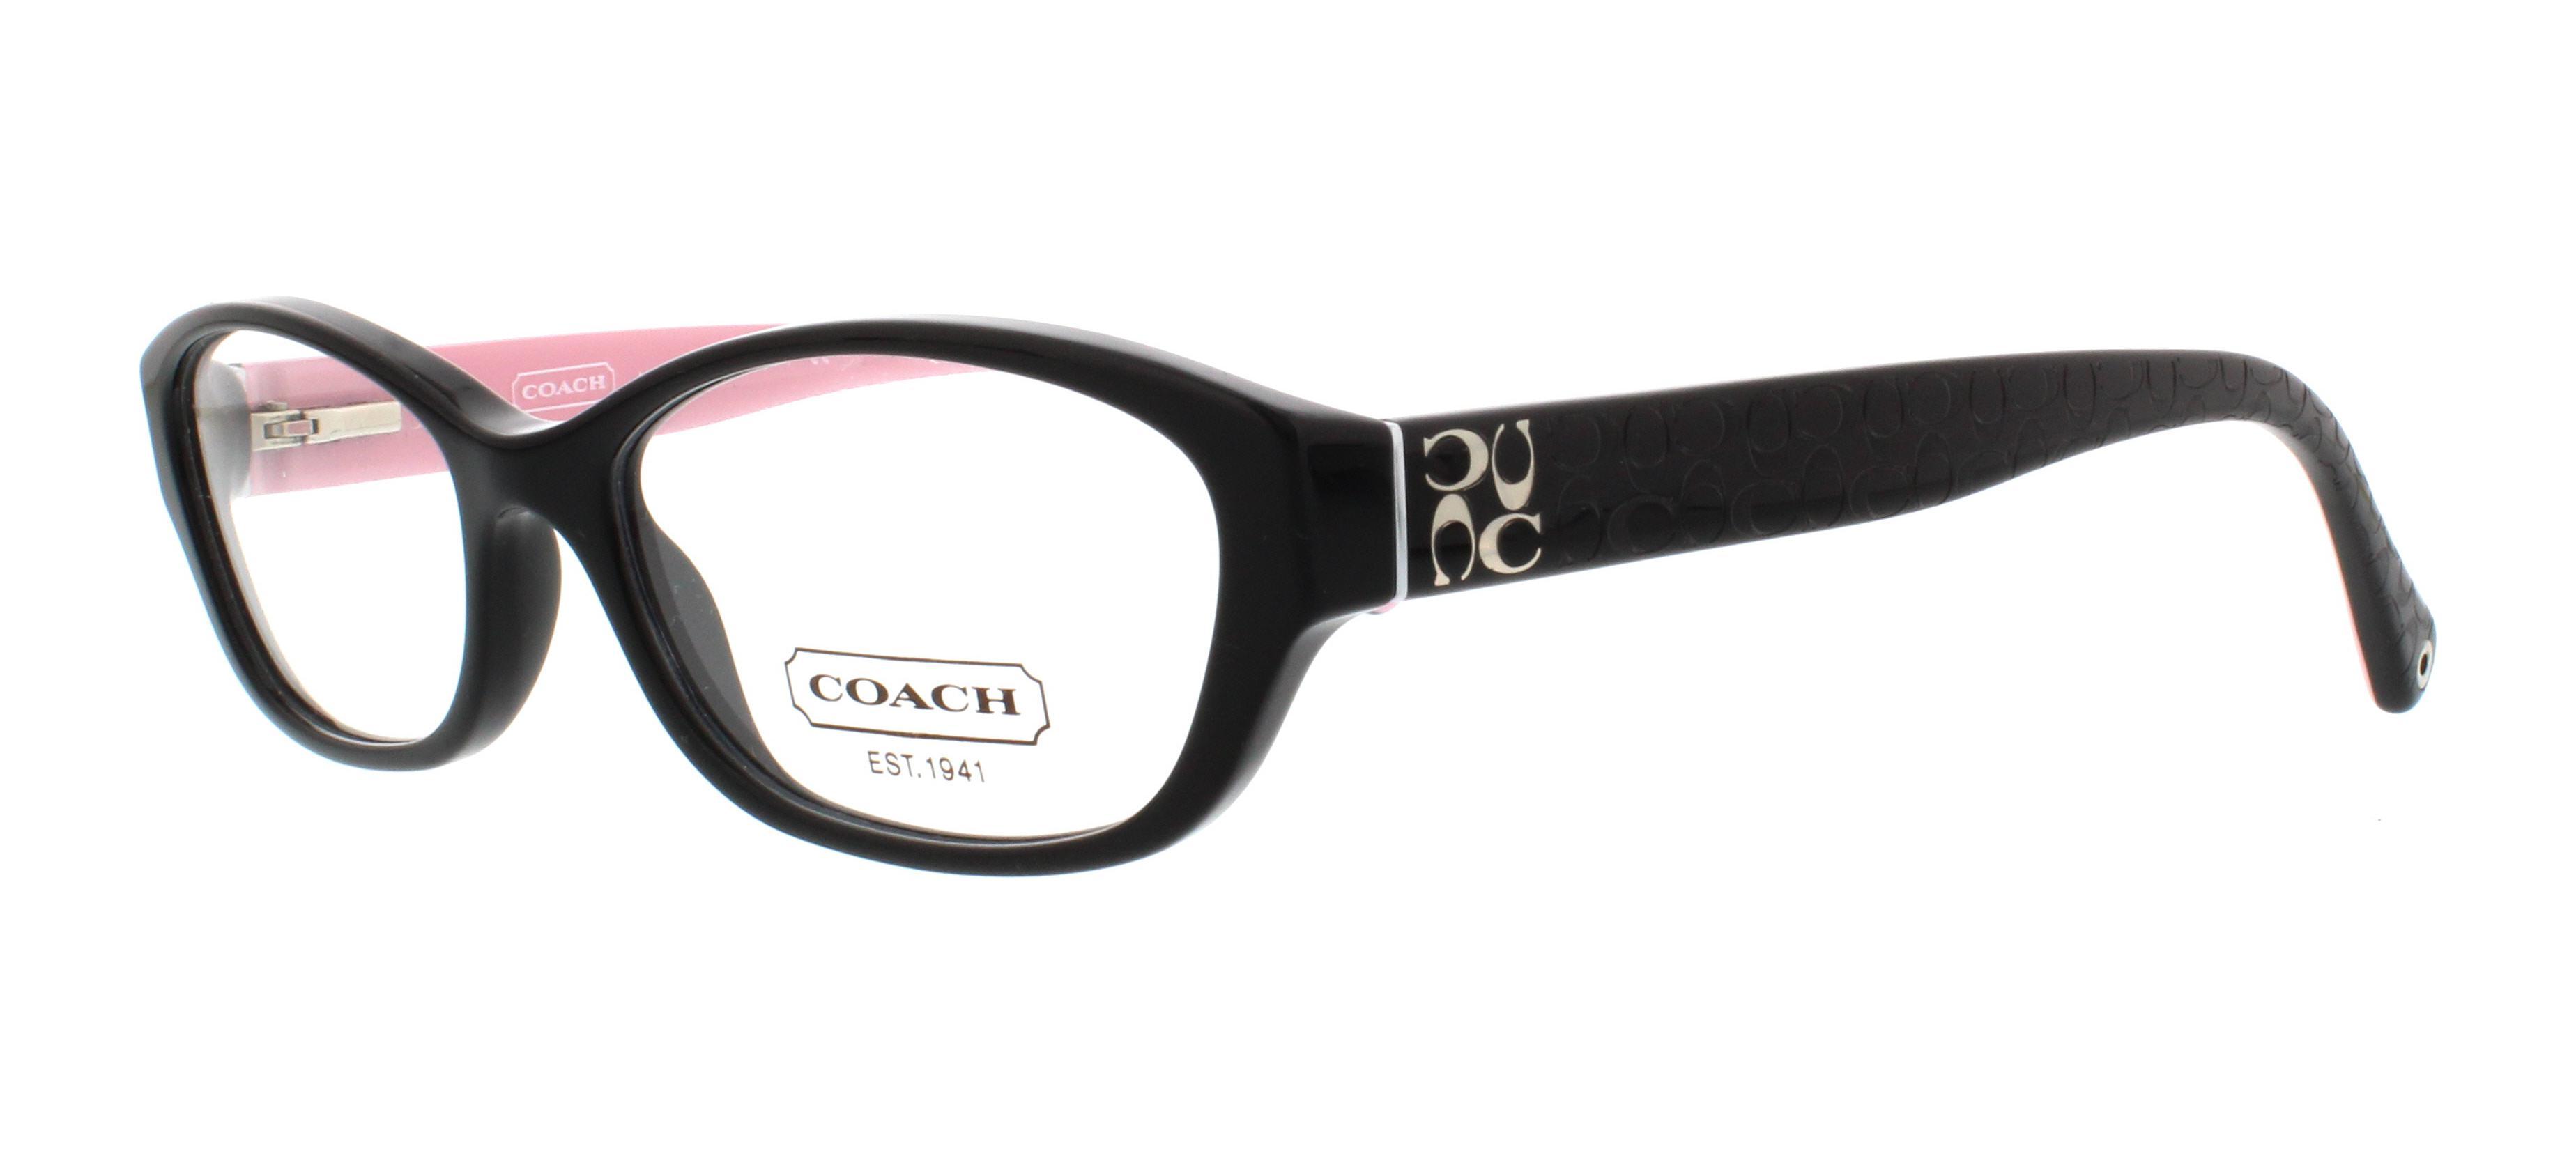 41cae84fca Designer Frames Outlet. Coach HC6002